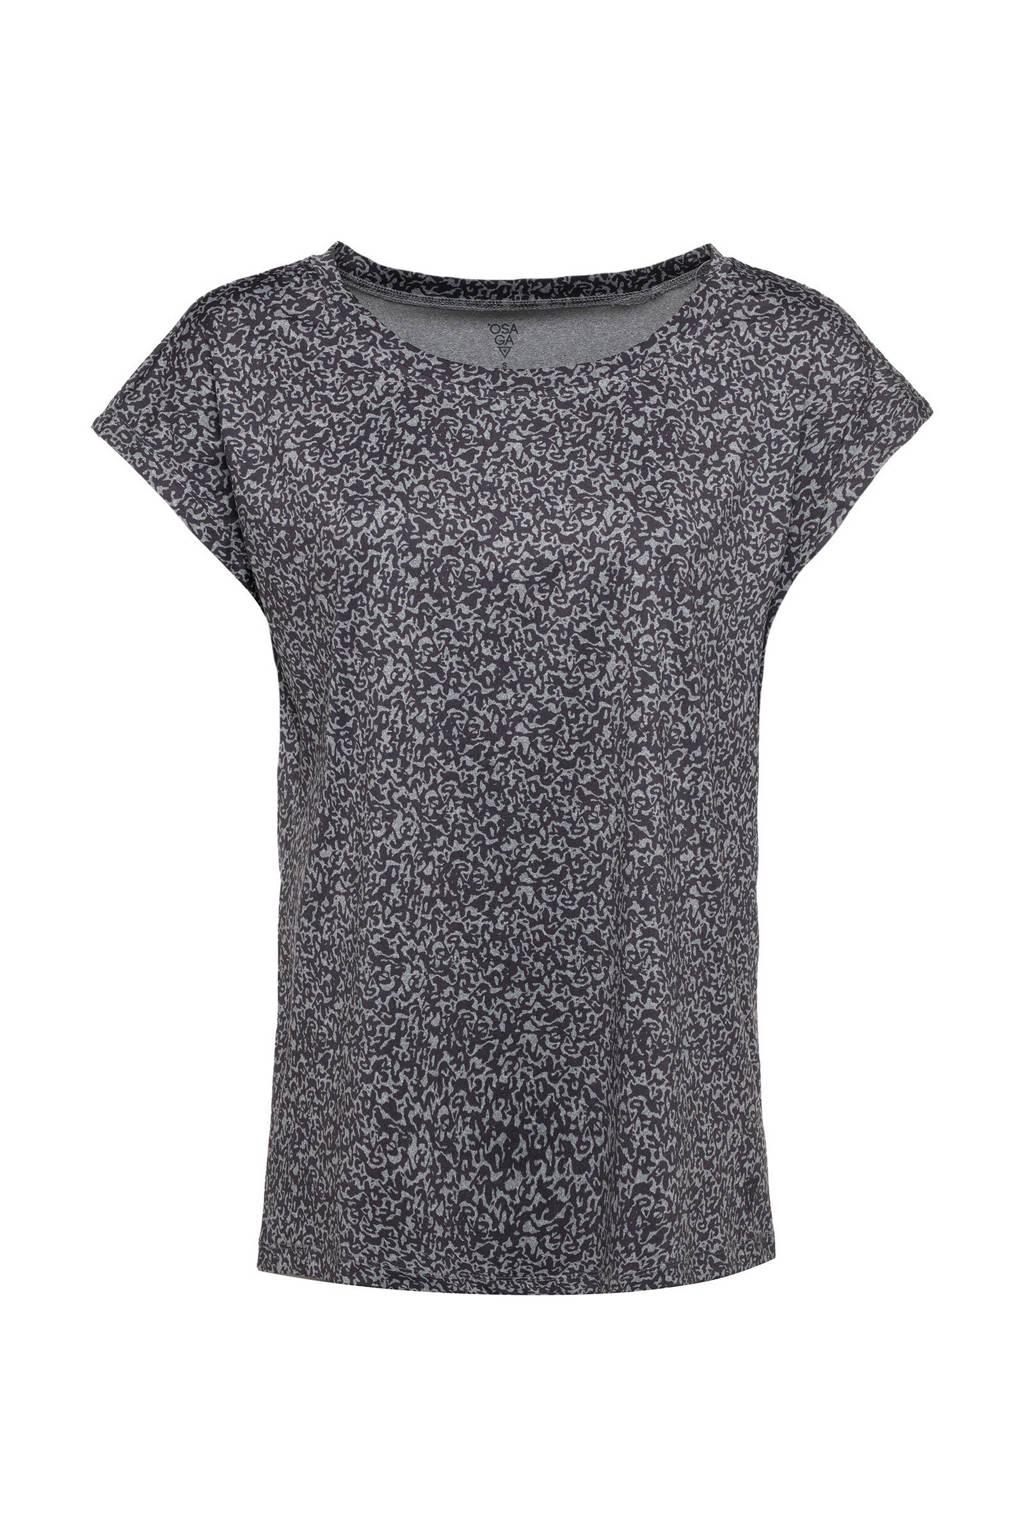 Scapino Osaga sport T-shirt grijs, Grijs